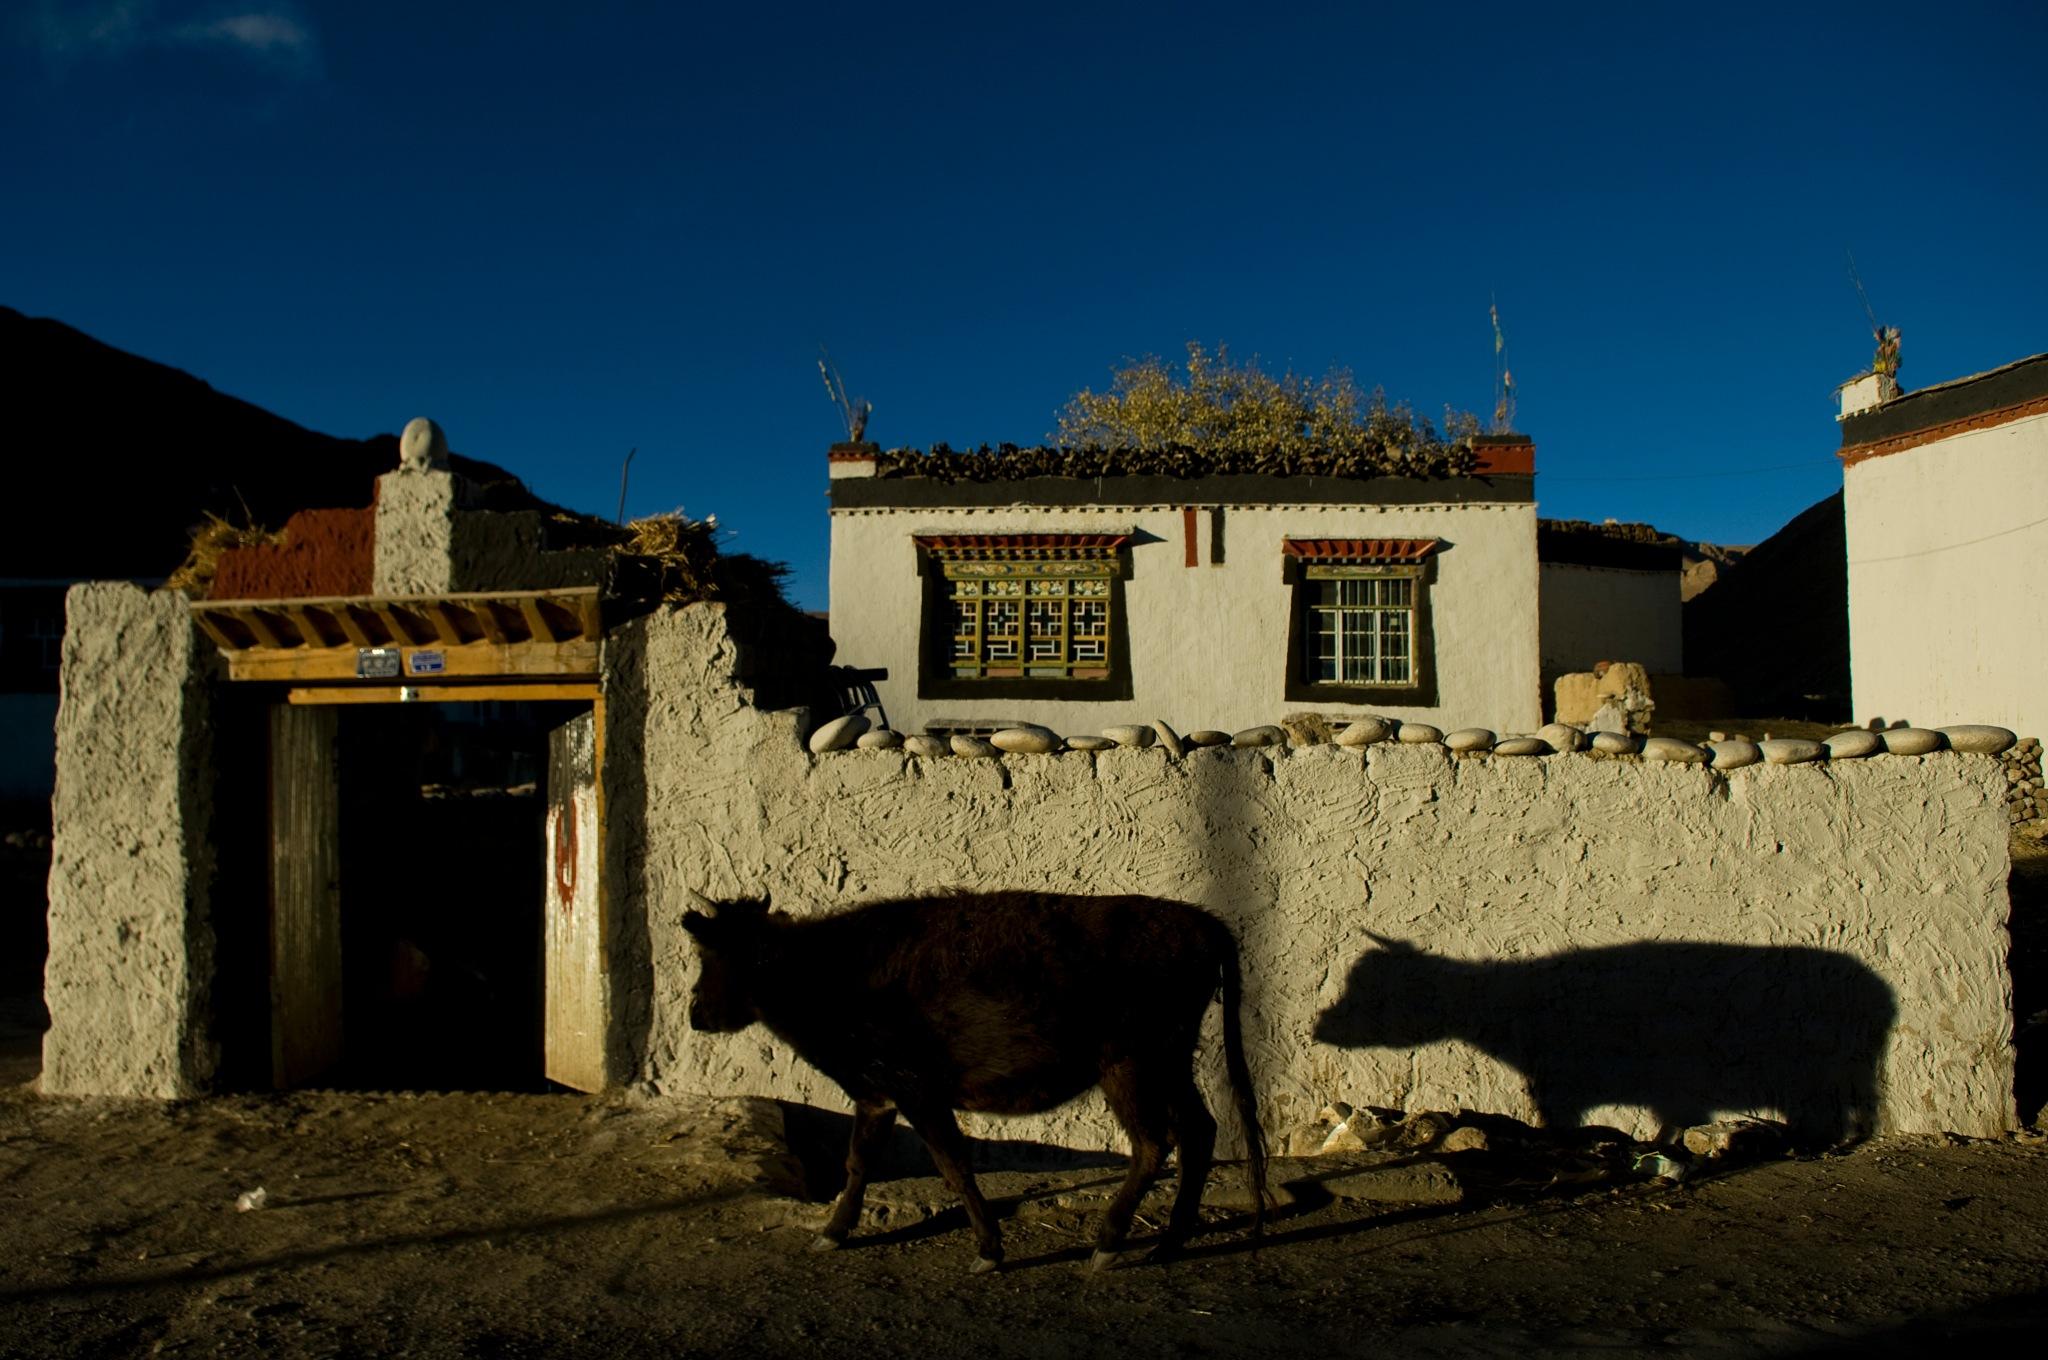 a cow and a shadow by Eran Yardeni